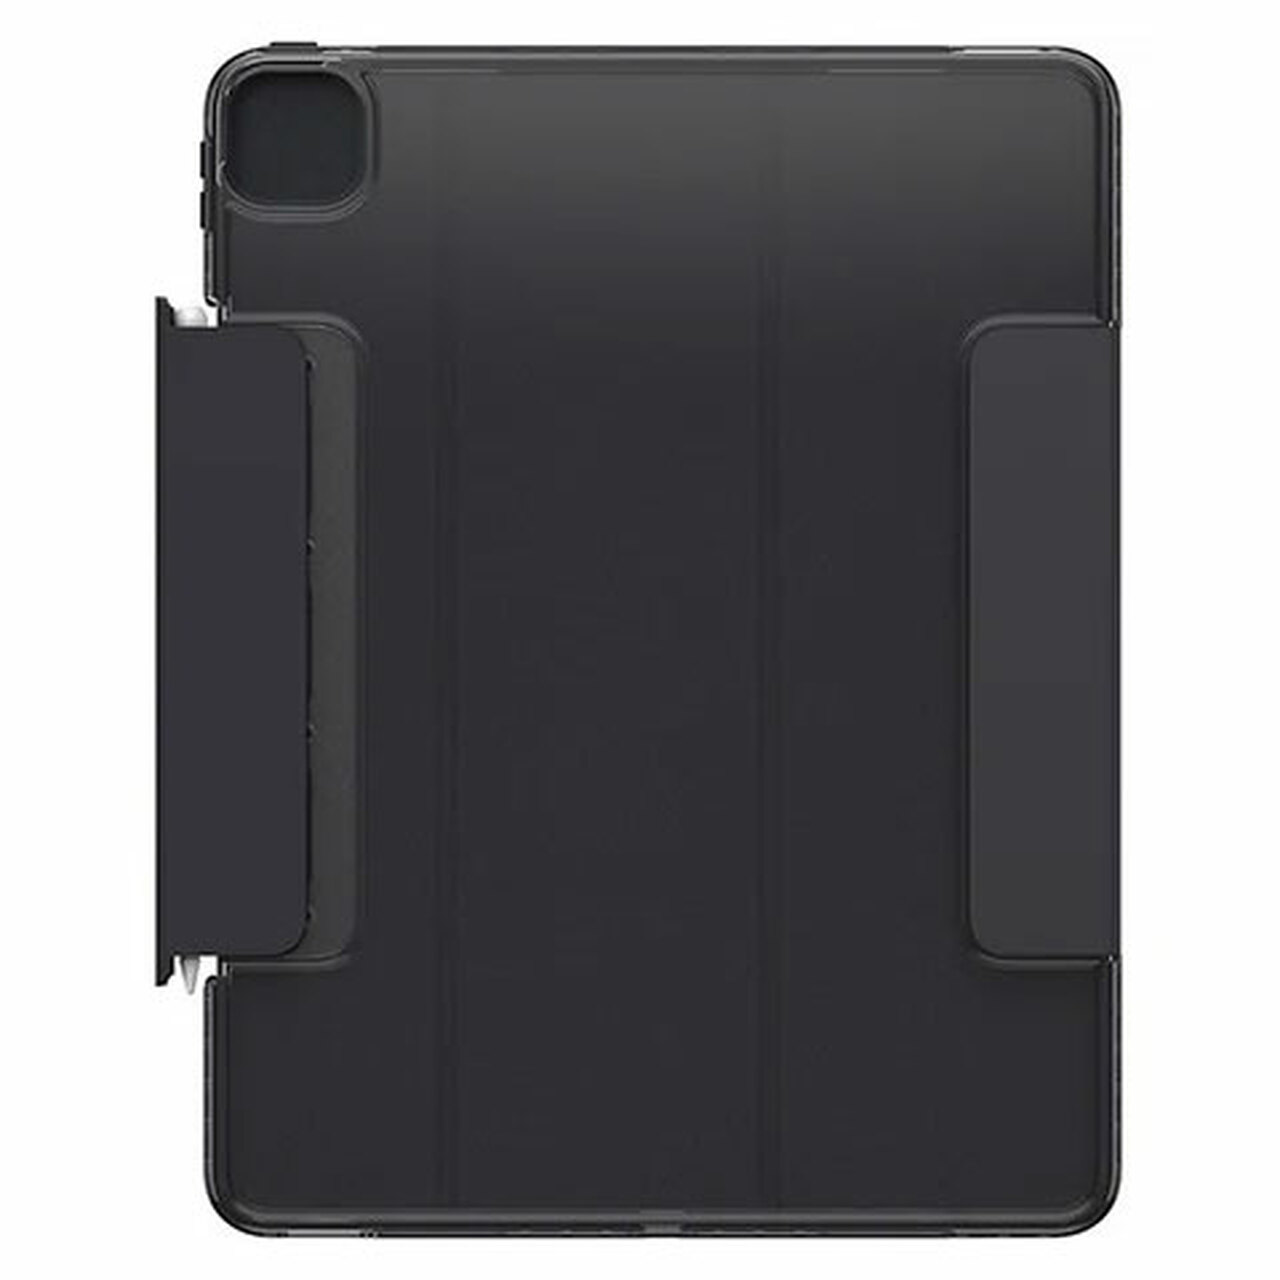 "OtterBox Symmetry 360 Elite Case for iPad Pro 12.9"" 5th ..."